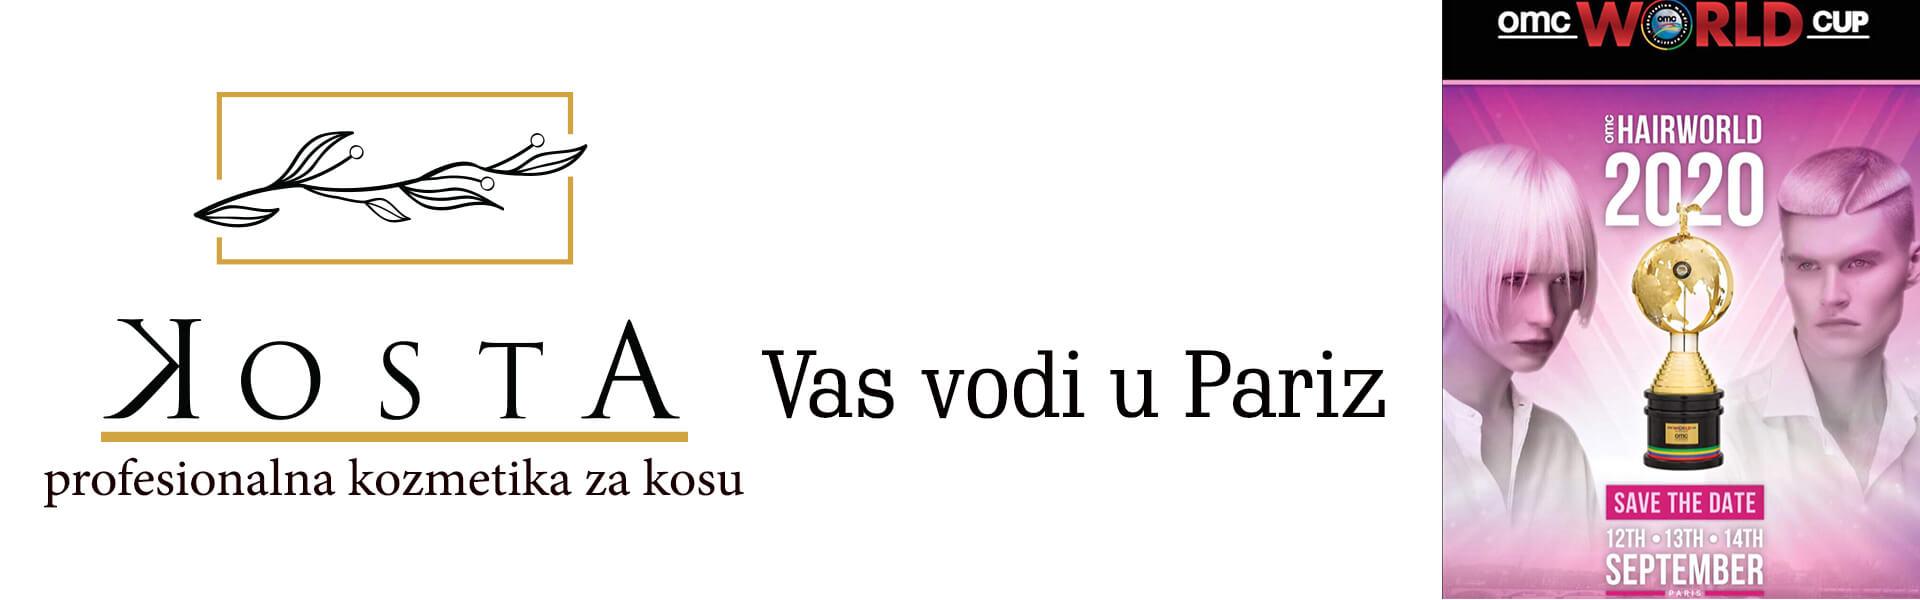 Kosta vas vodi u Pariz